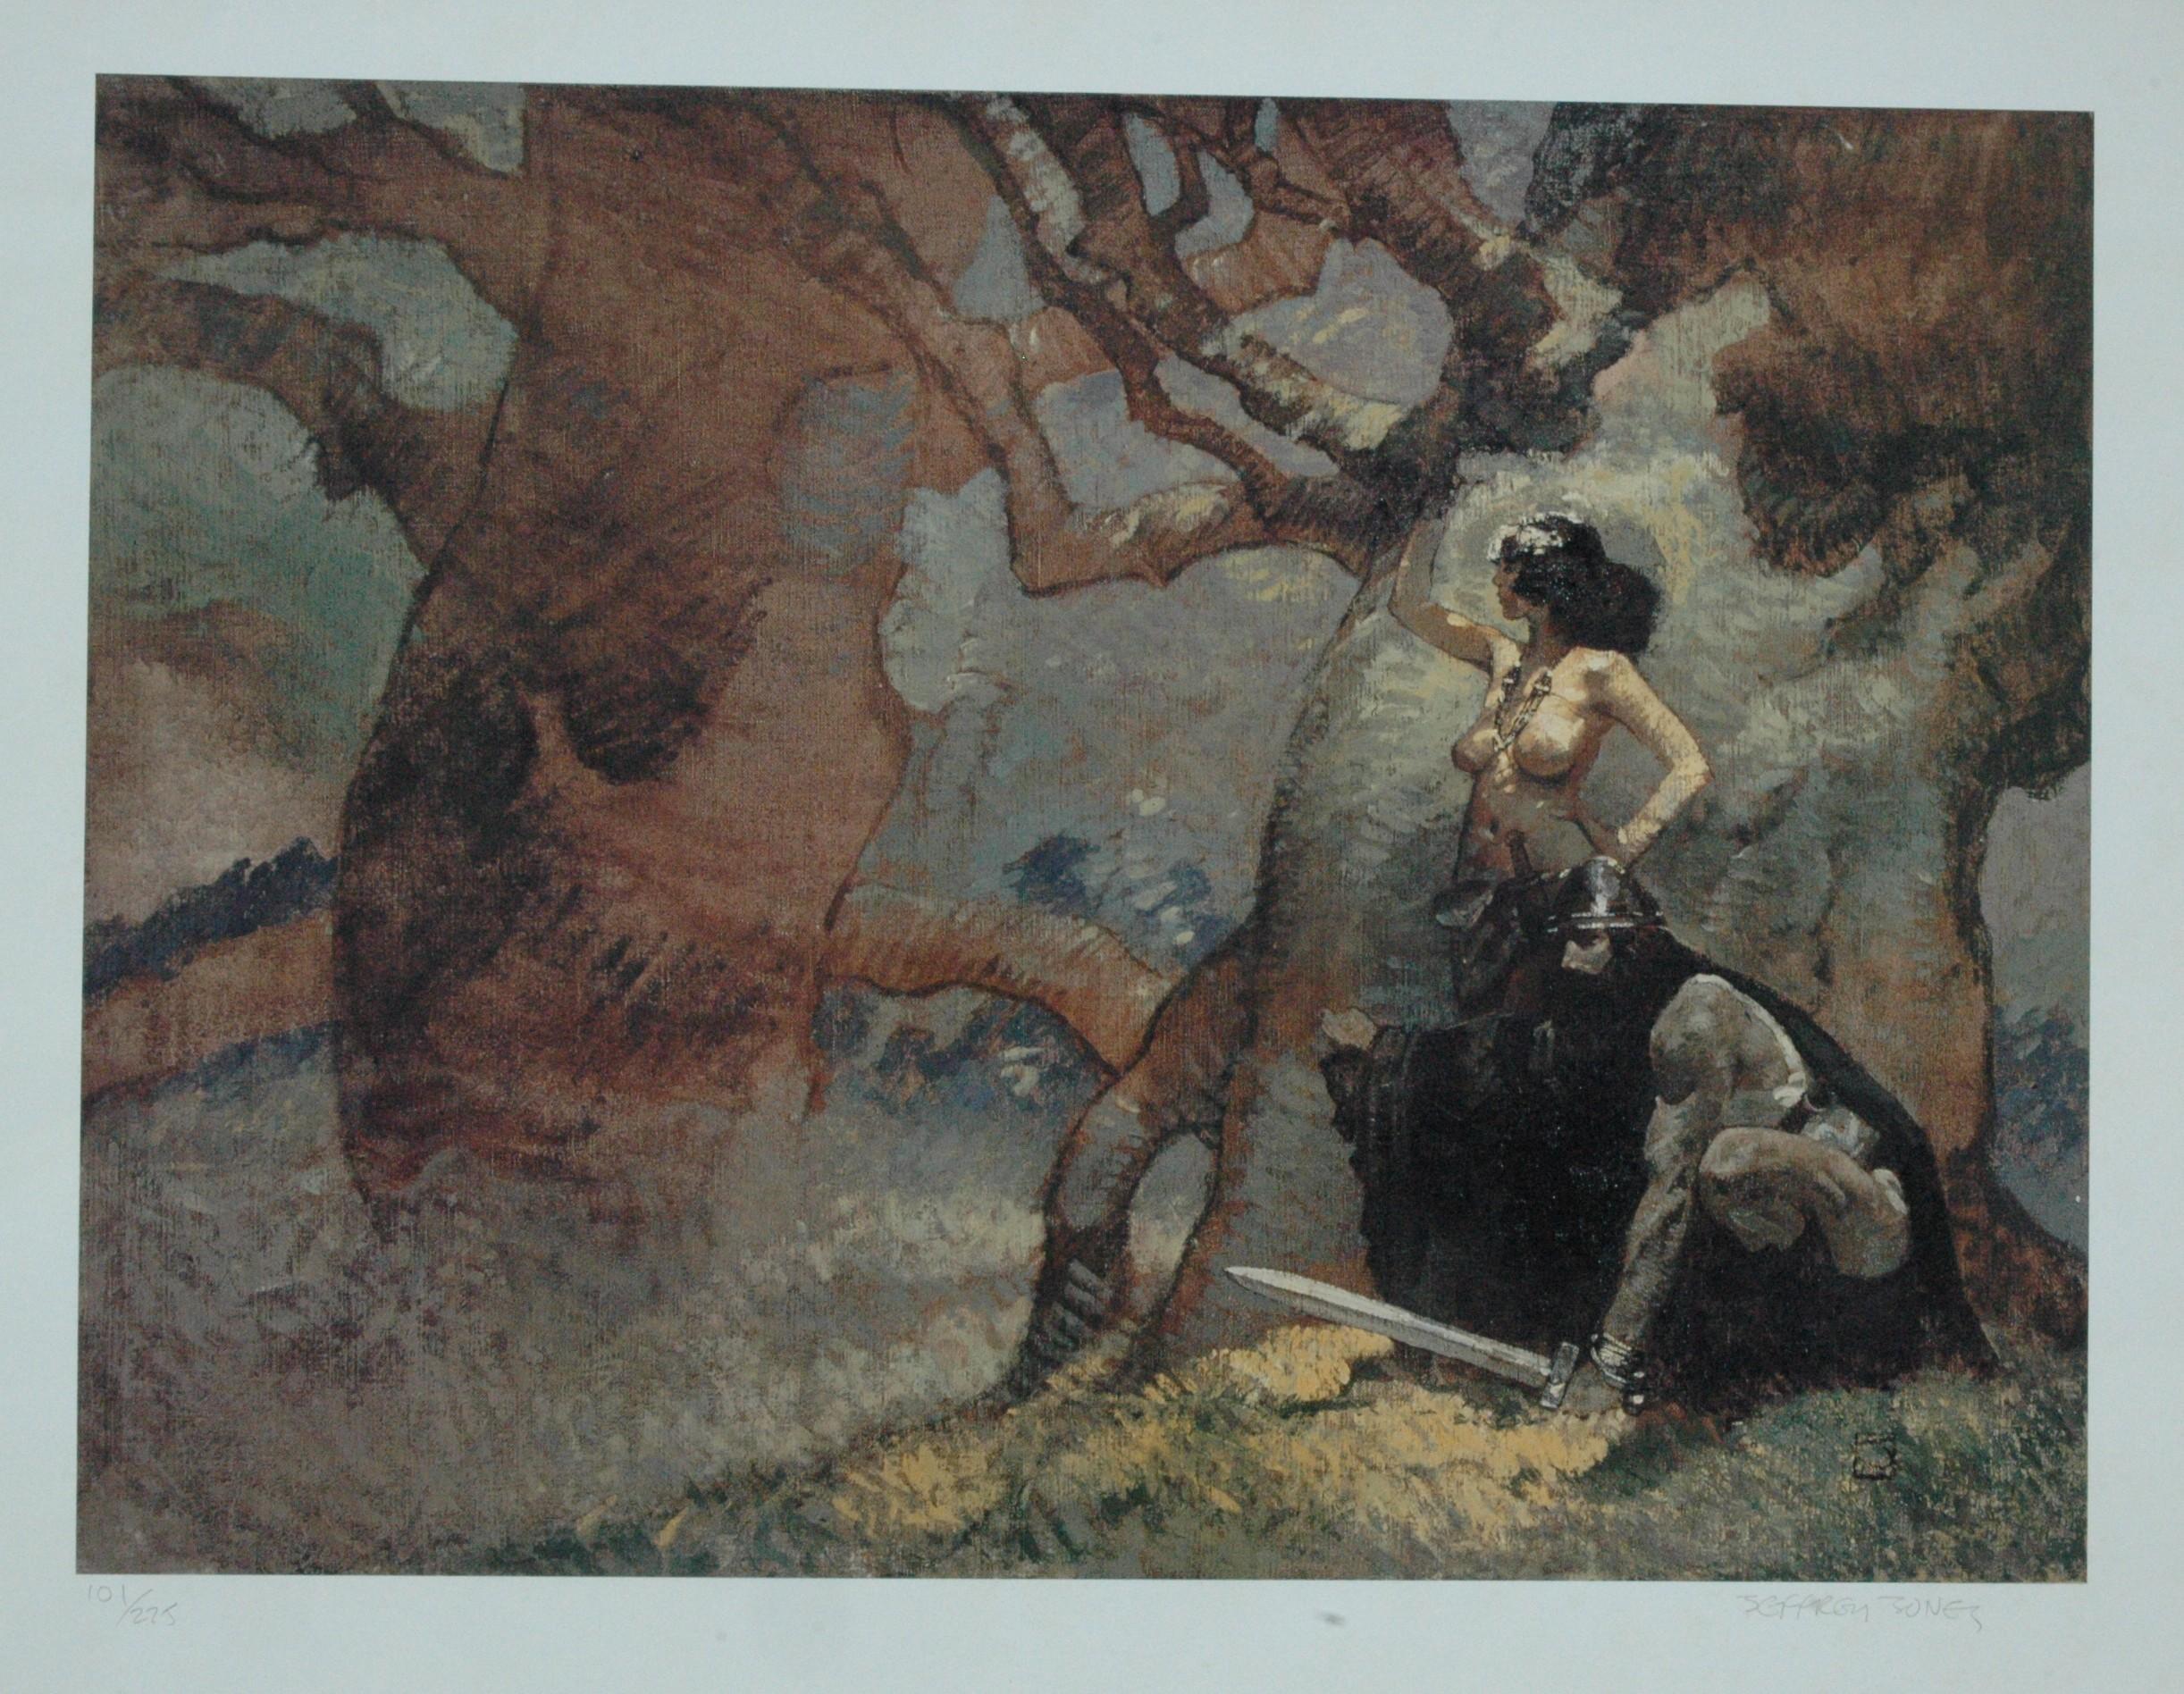 Look Here: Various prints by Jeffrey Jones – Ragged Claws ...